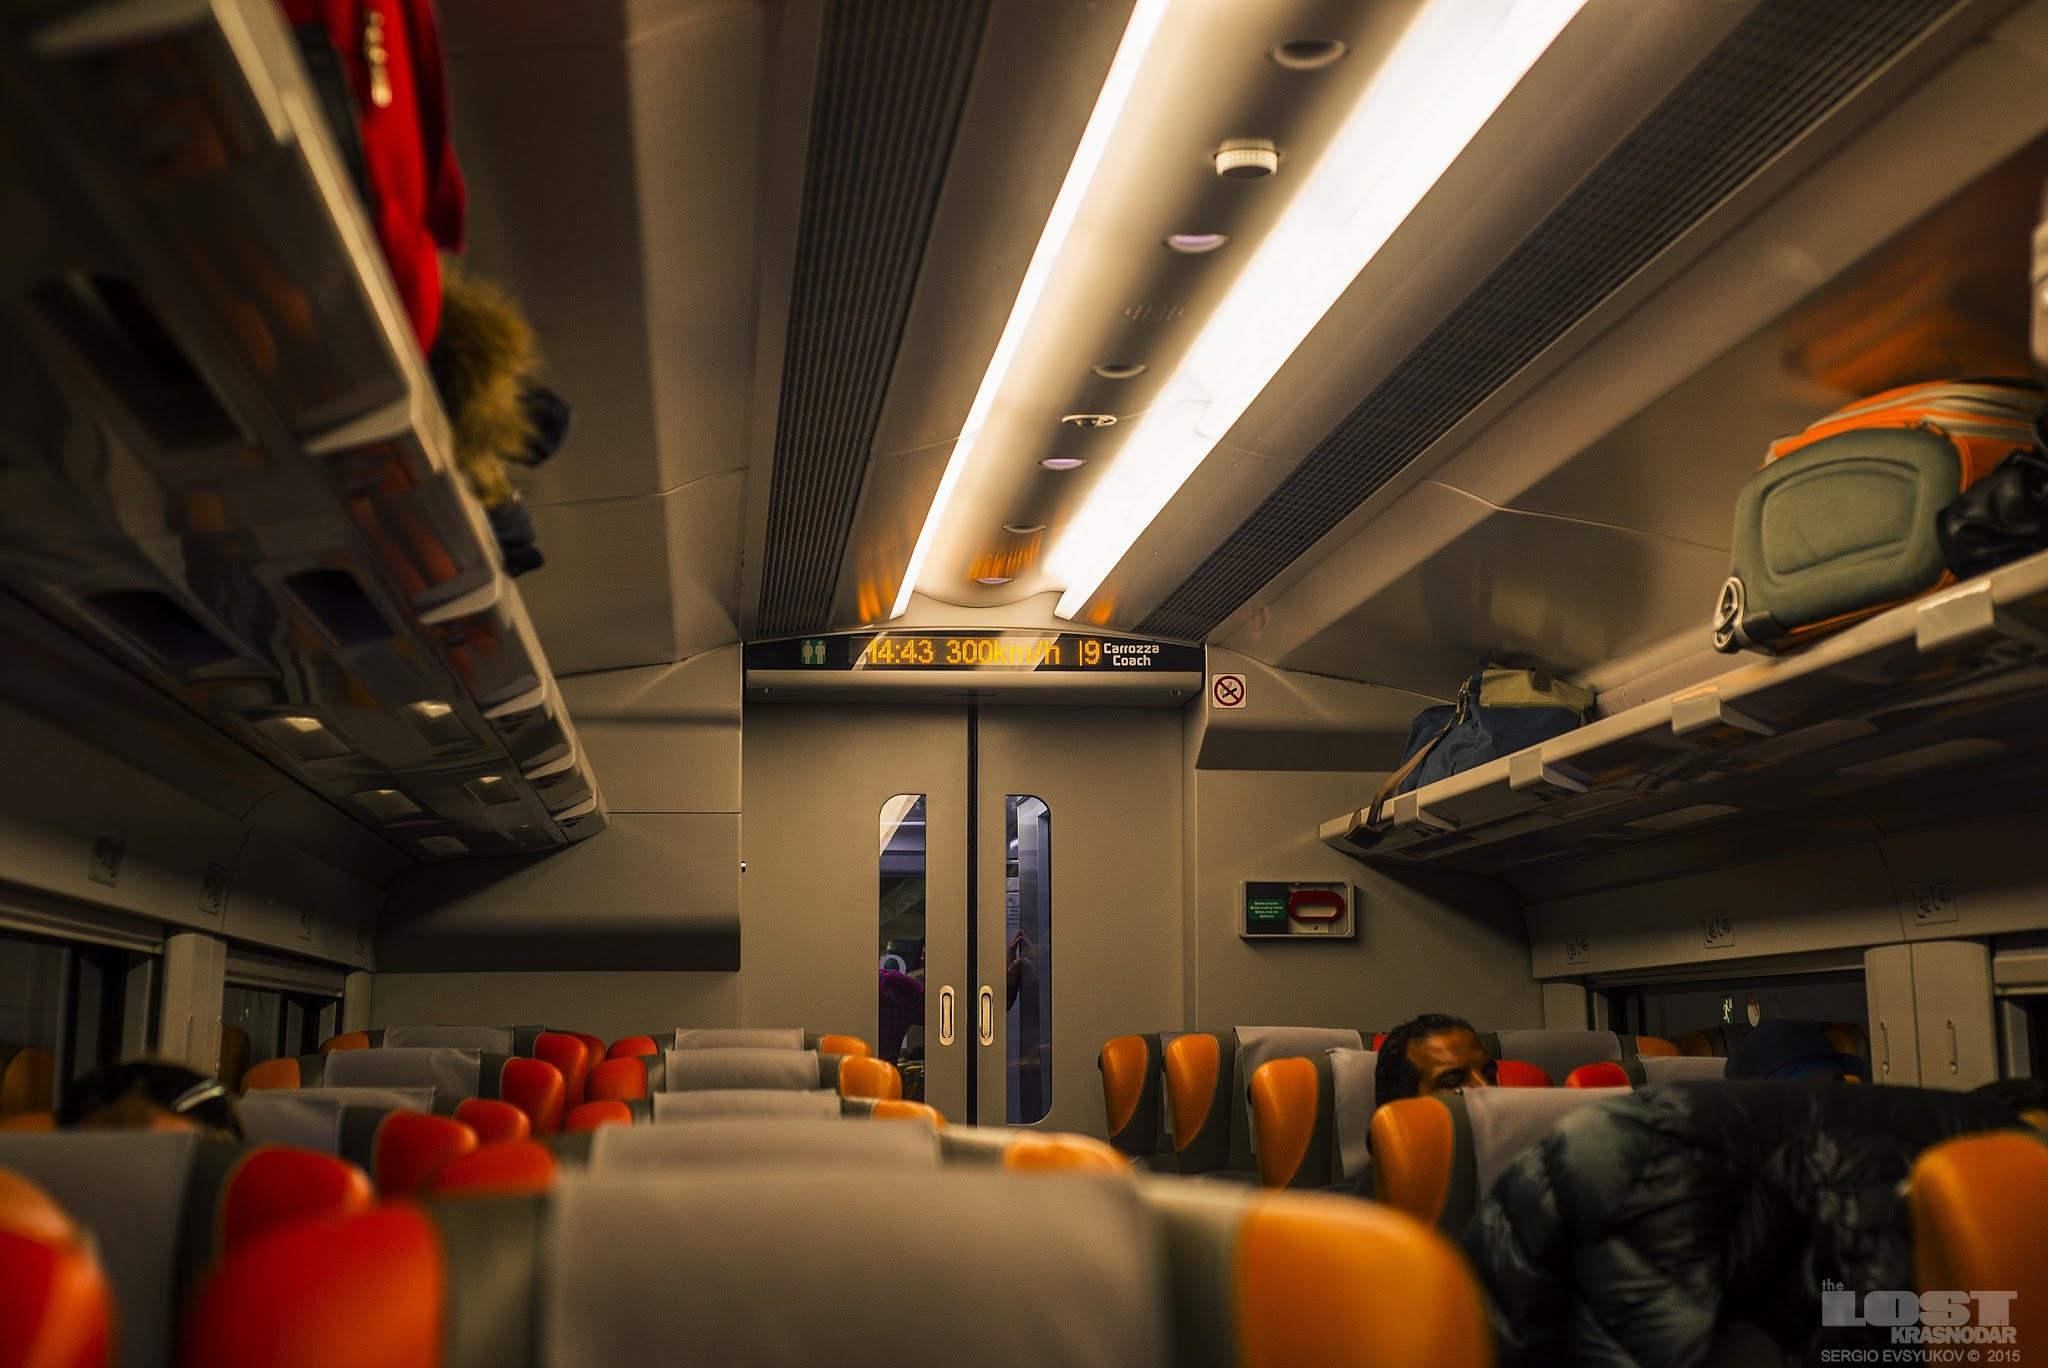 Italo railway